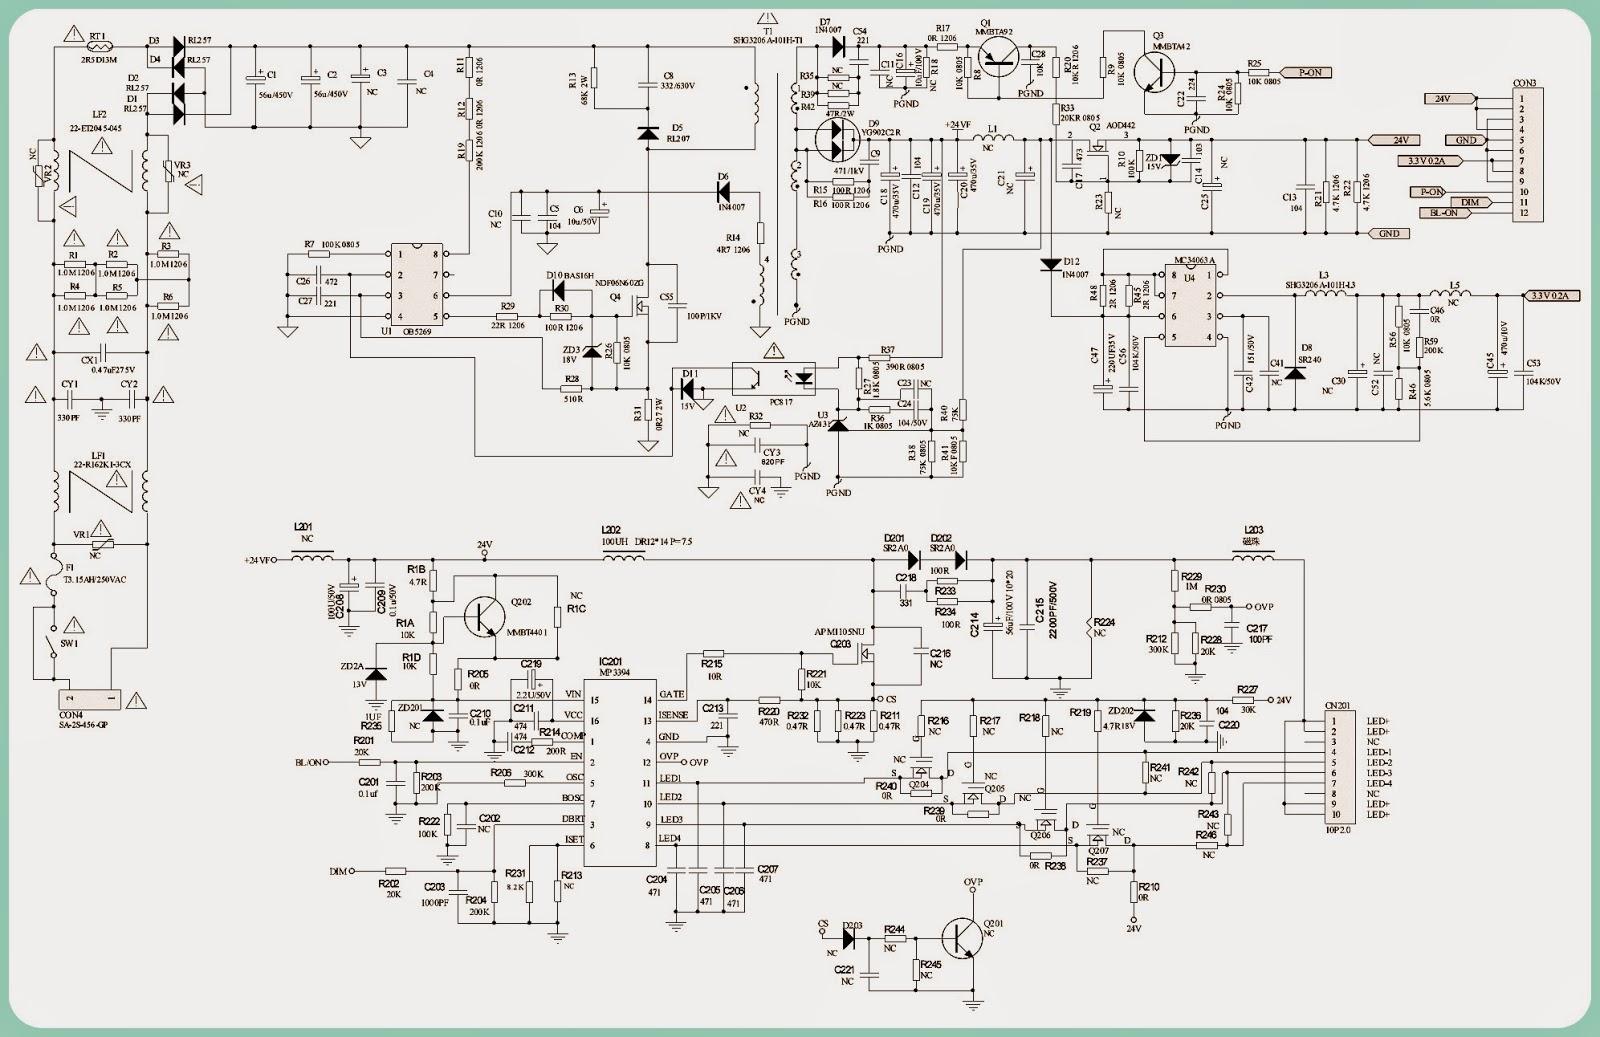 lg flatron w1942s lcd monitor aocl32w831 philco28t35dg lg appliance schematics lg tv troubleshooting [ 1600 x 1037 Pixel ]